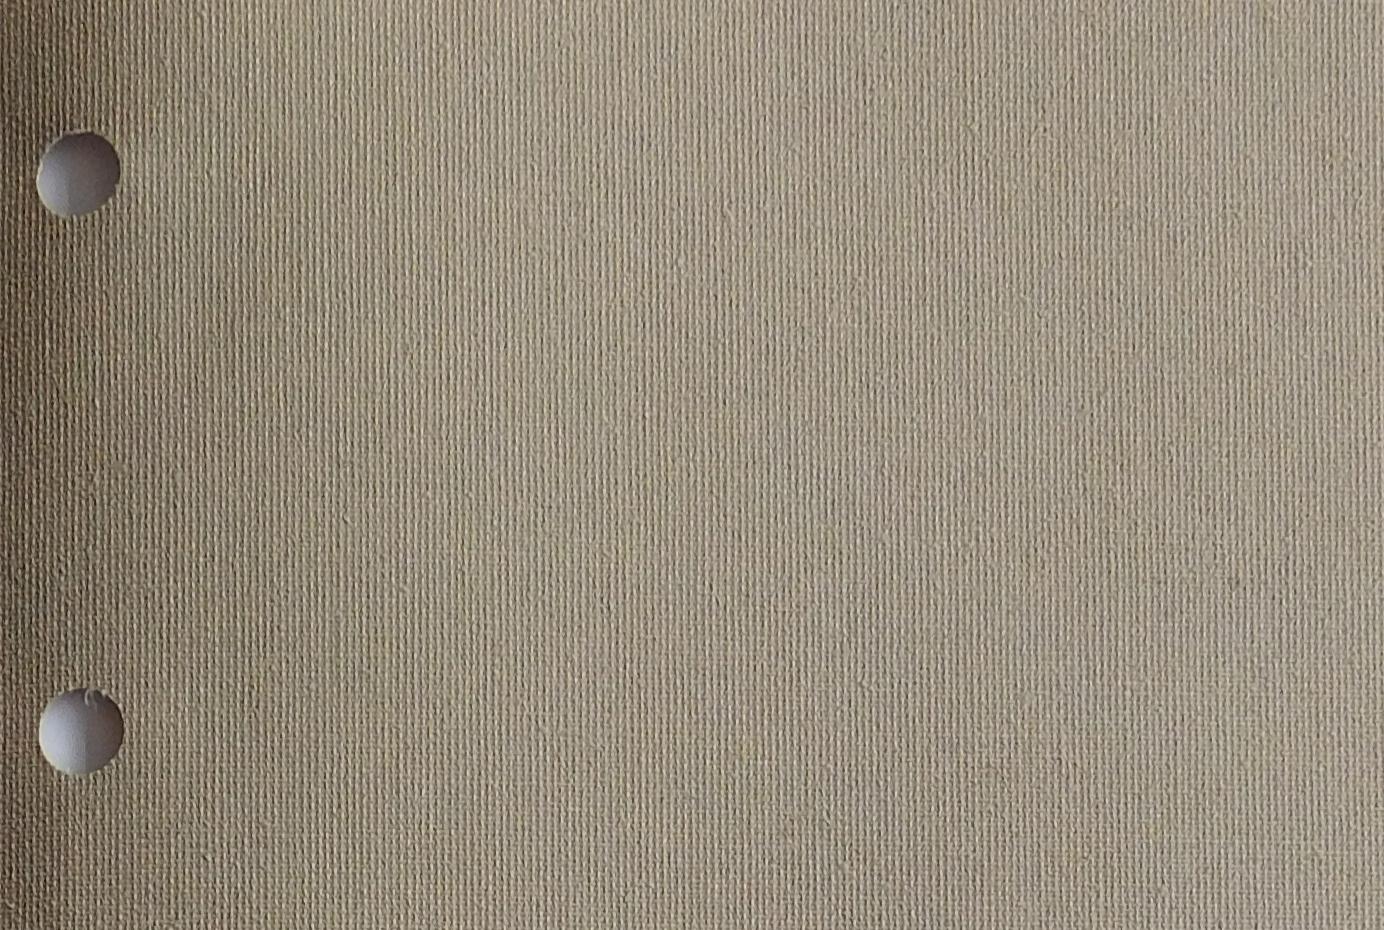 Polaris Oatmeal blind fabric